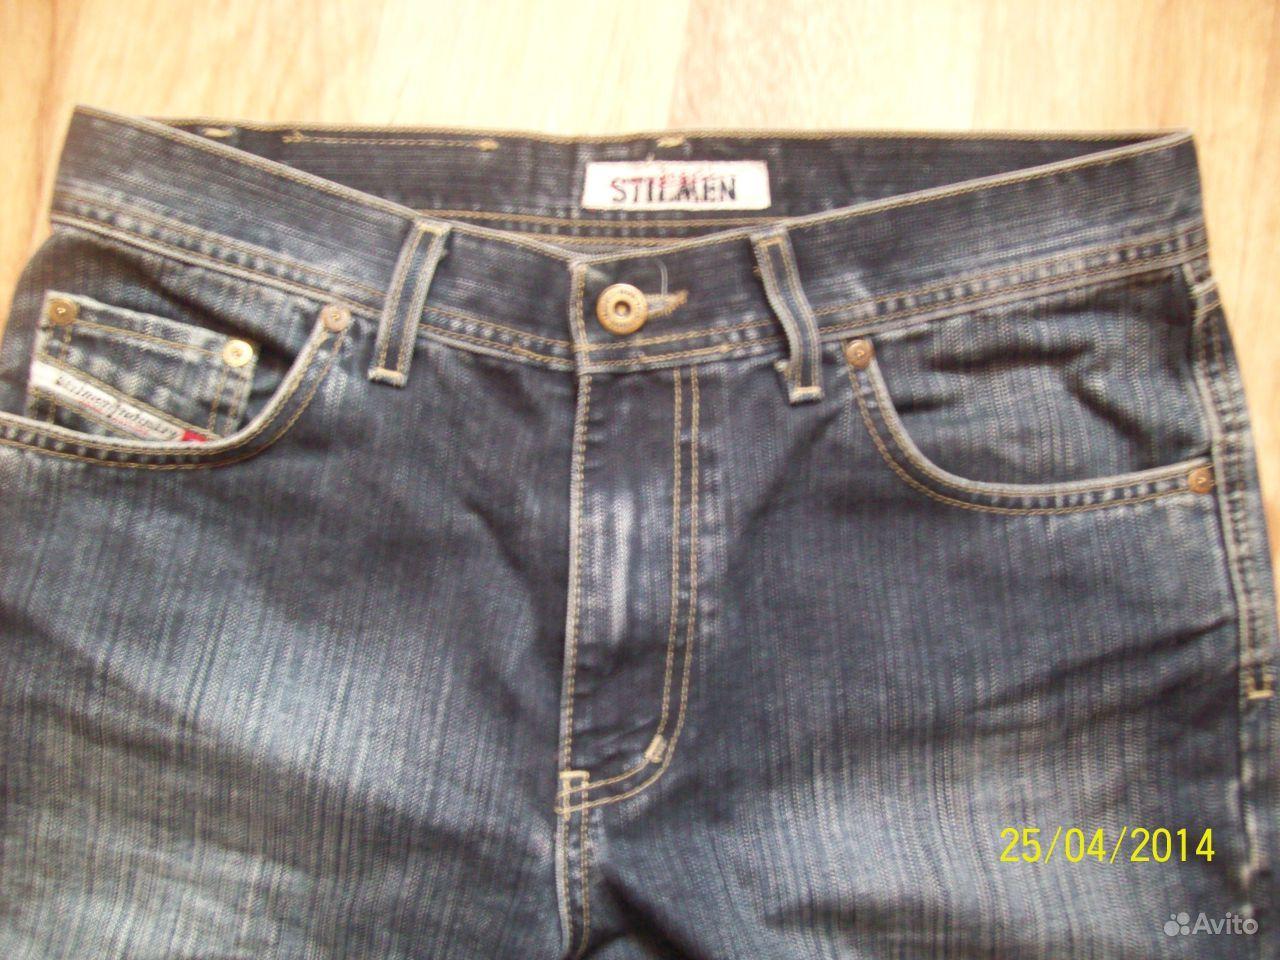 Снимает джинси фото 12 фотография